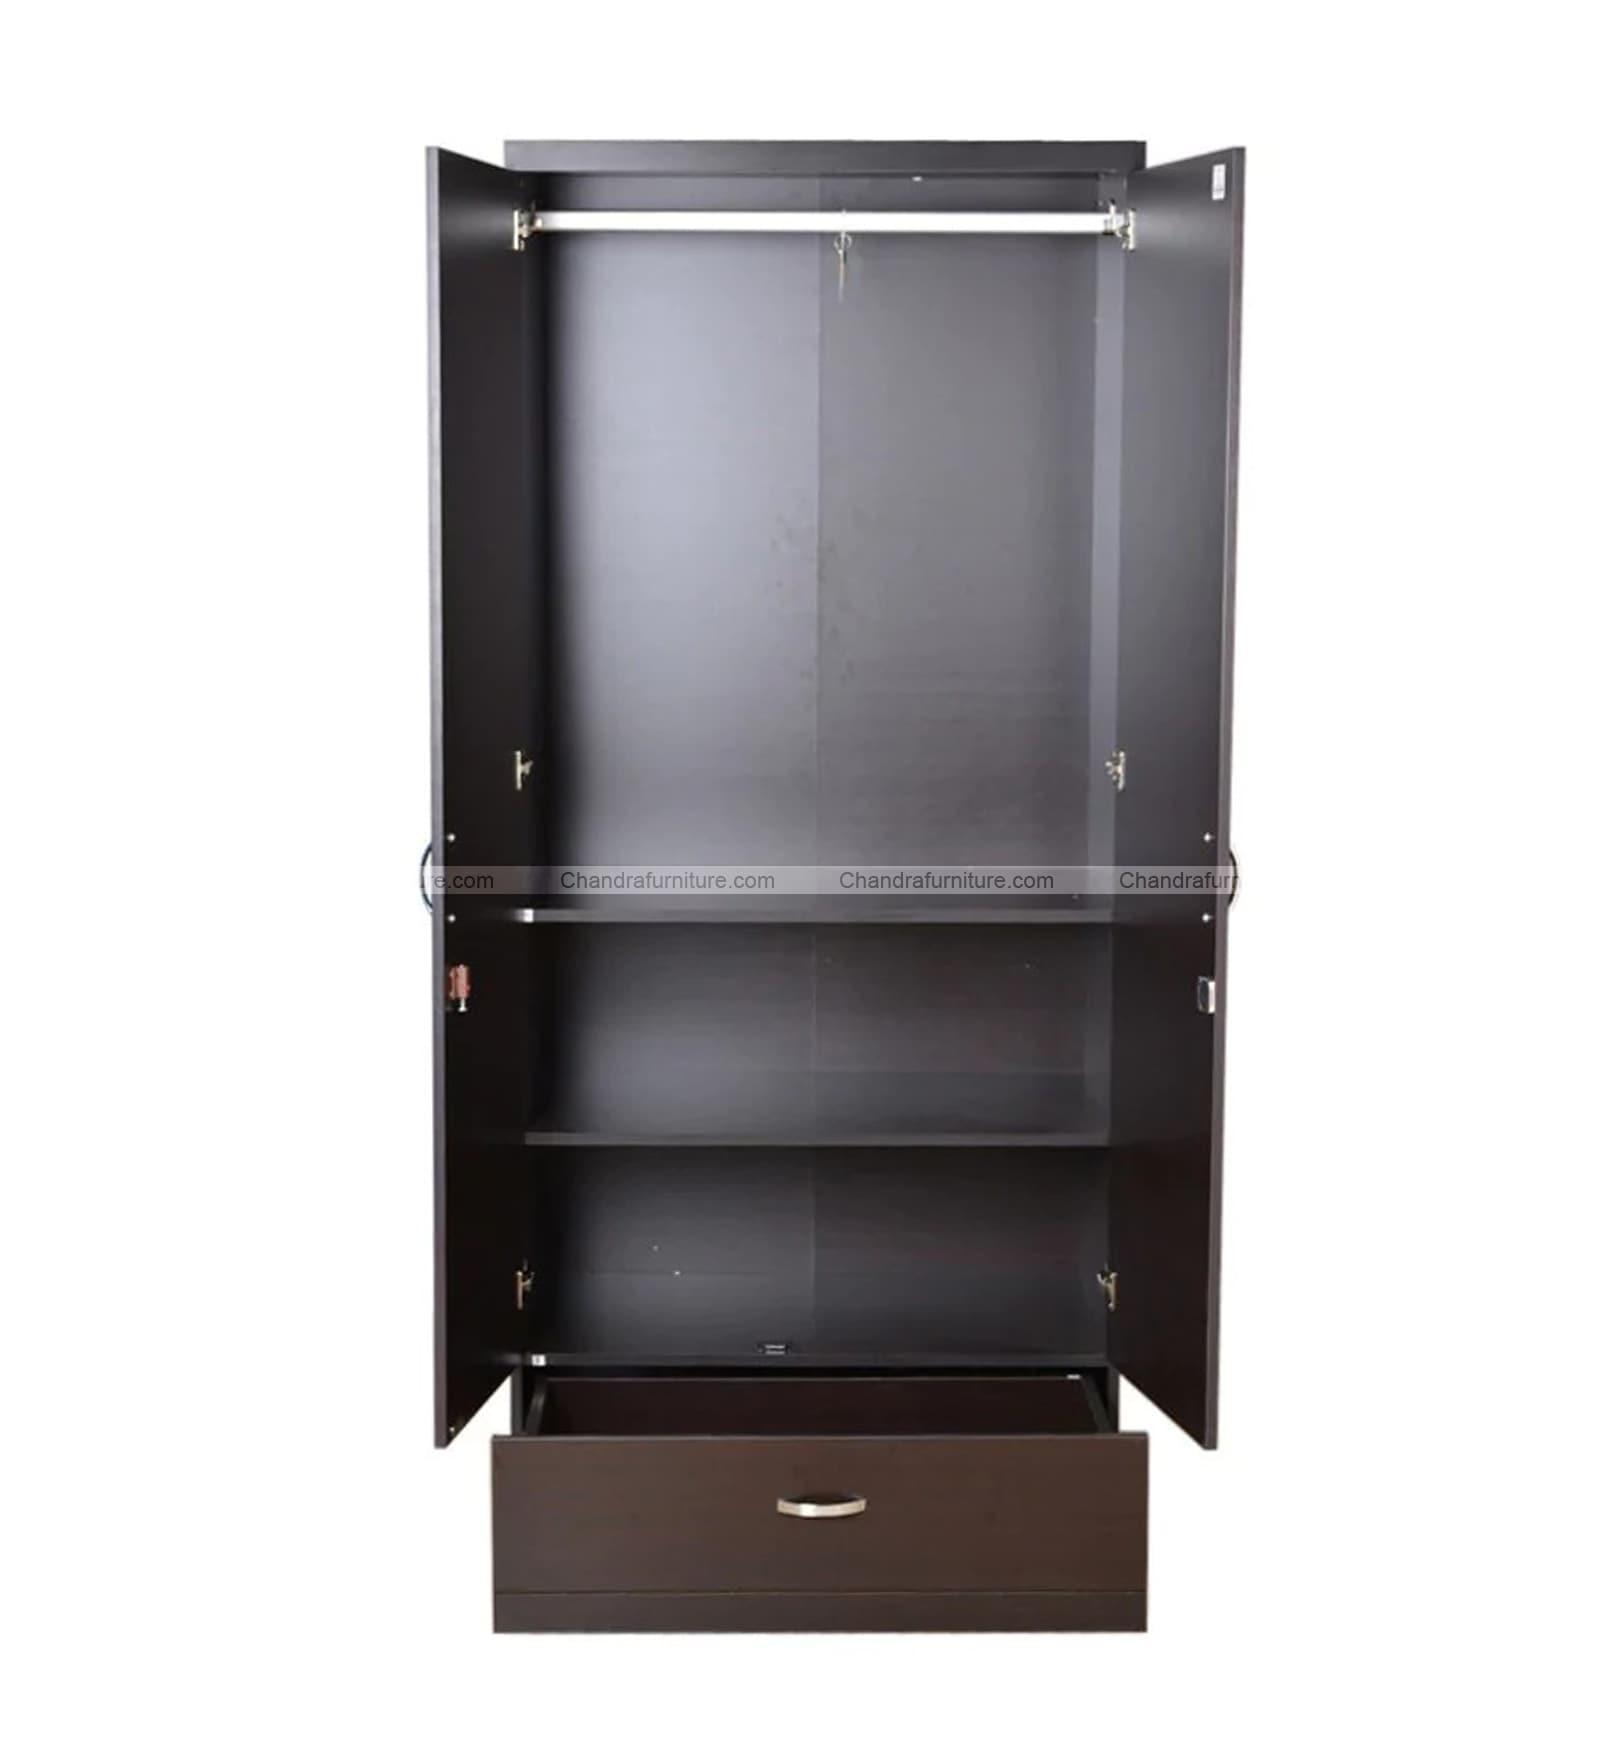 Chandra Furniture Cozy2  Two Door Wardrobe With Mirror  Dark Colour